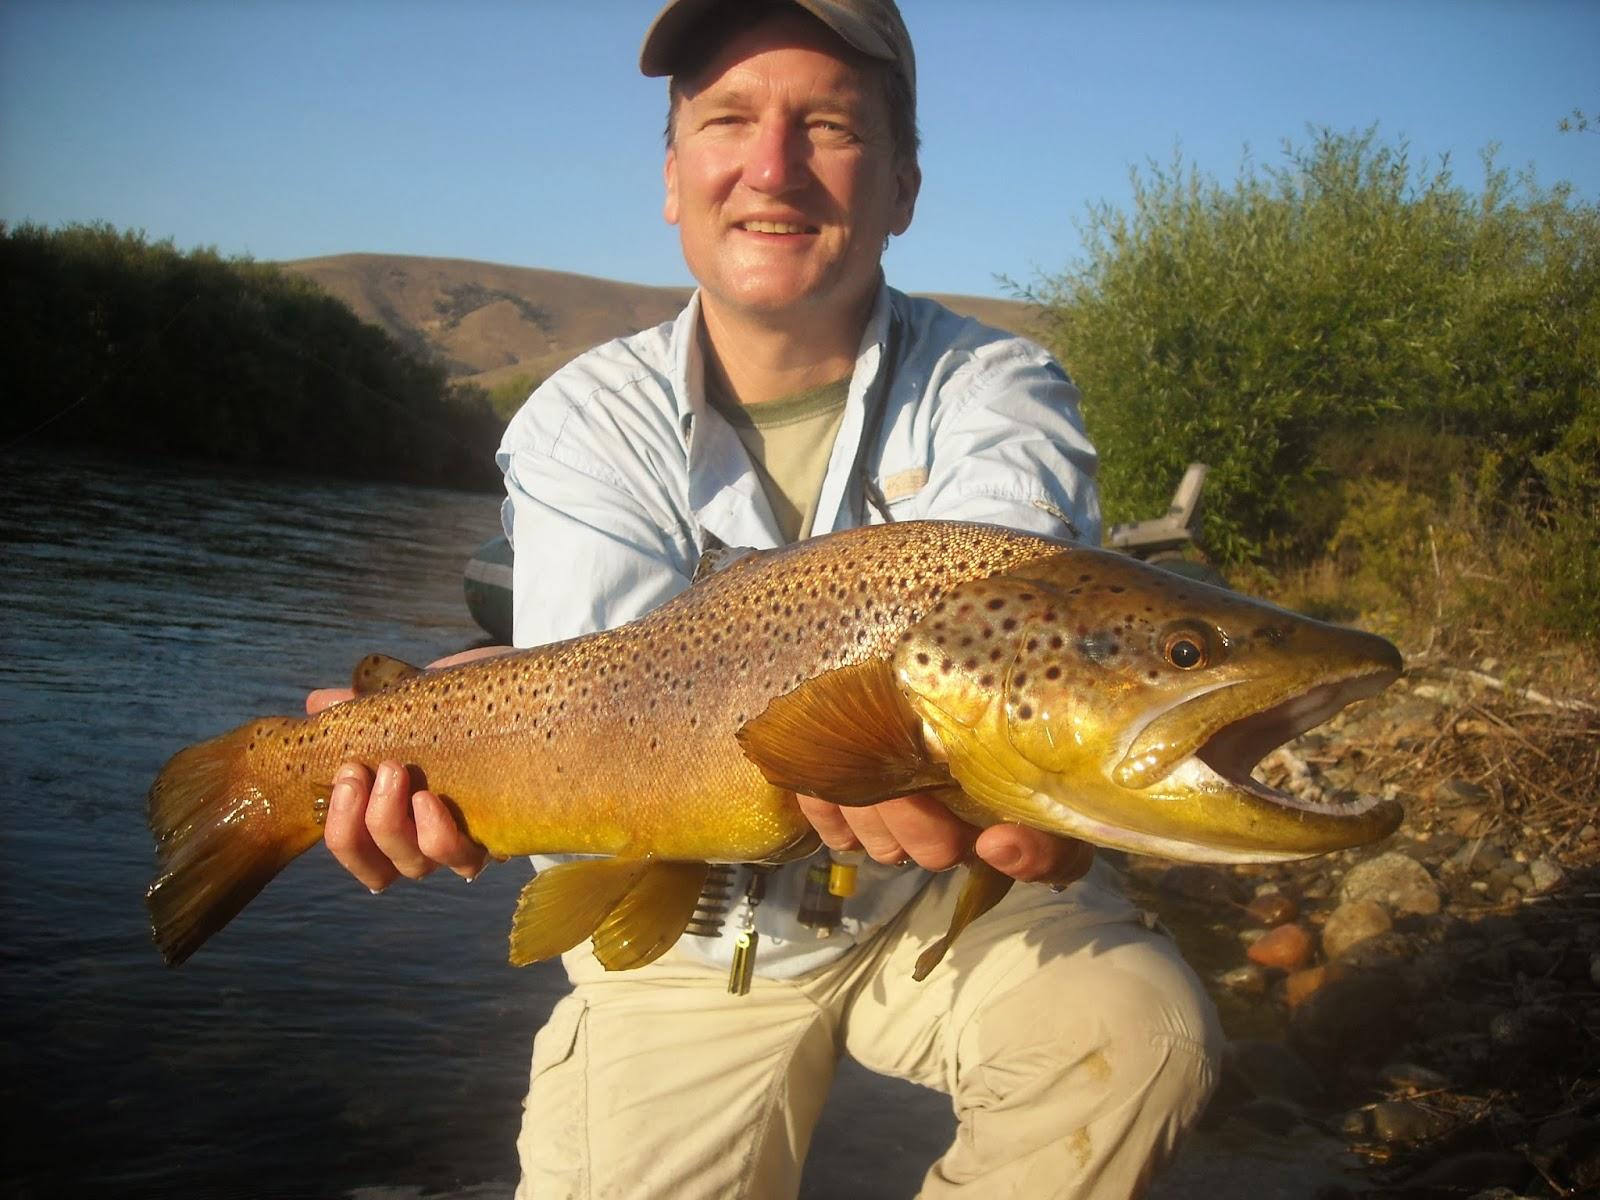 Diy fly fishing patagonia argentina trout sea run for Diy fly fishing